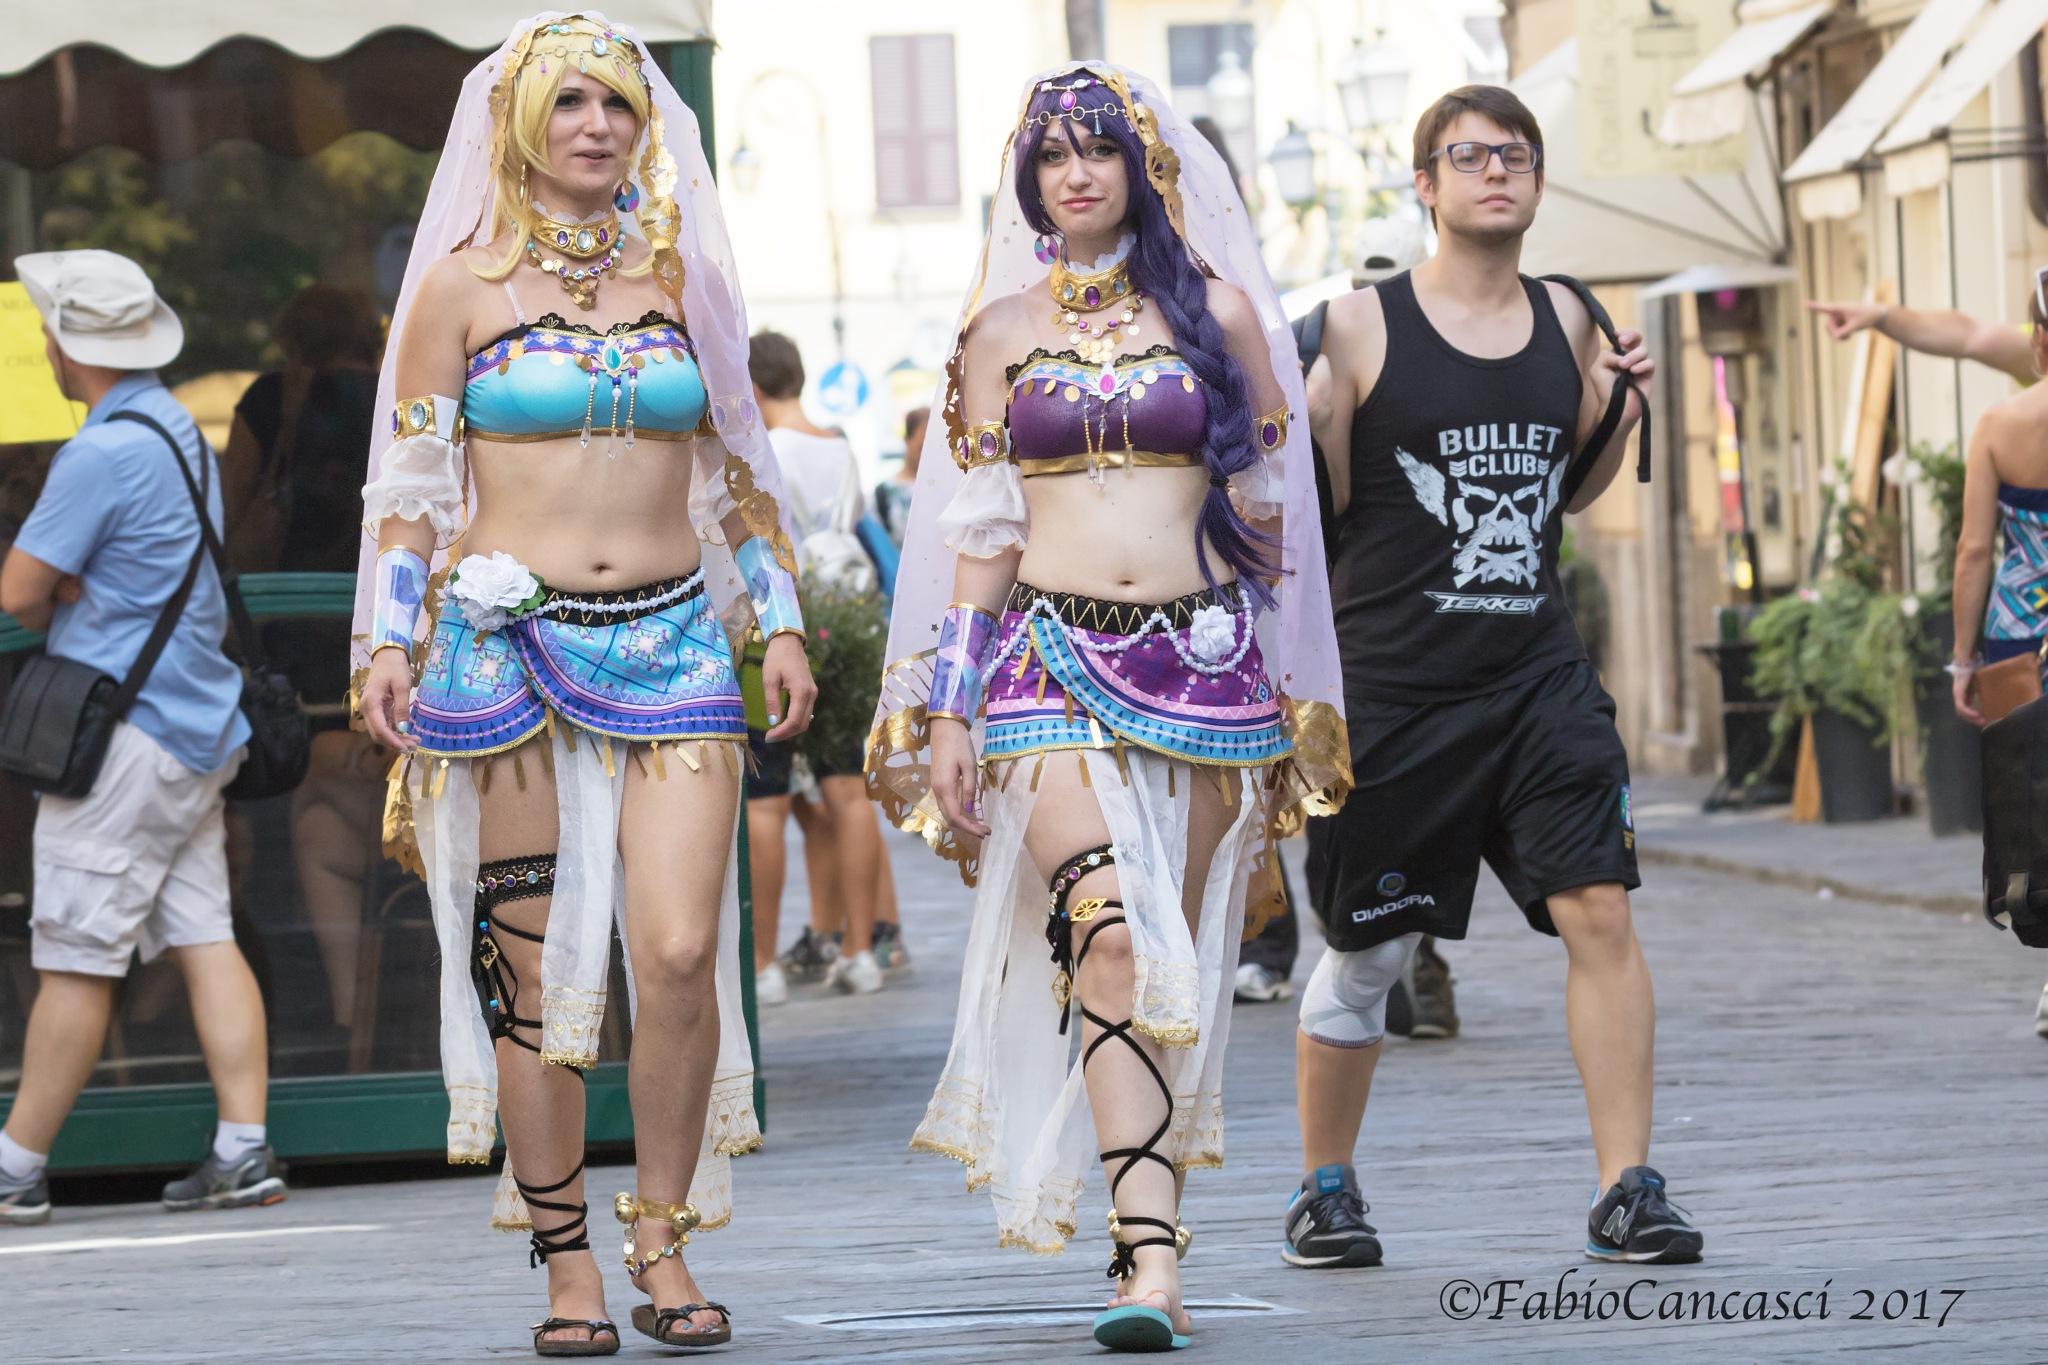 cosplay by Fabio C.